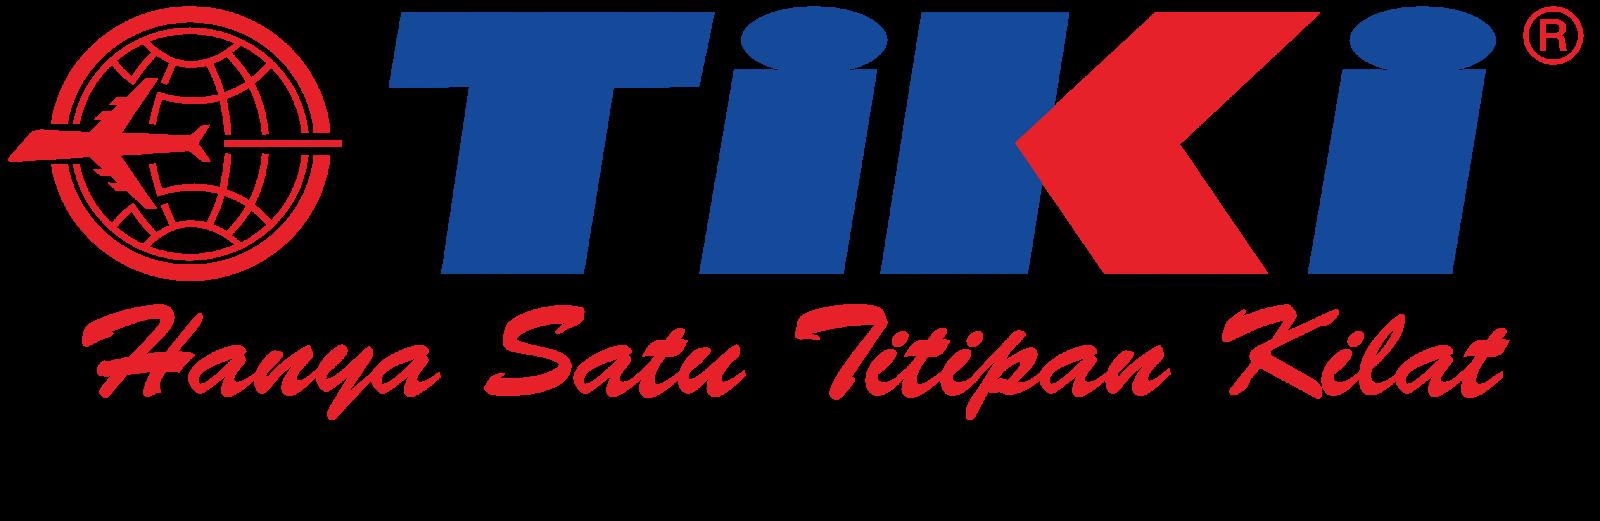 Cek Jasa Pengiriman Barang Kurir Ekspedisi Cargo Kantor Pusat Tiki Hanya Satu Titipan Kilat Desain Logo Kilat Desain